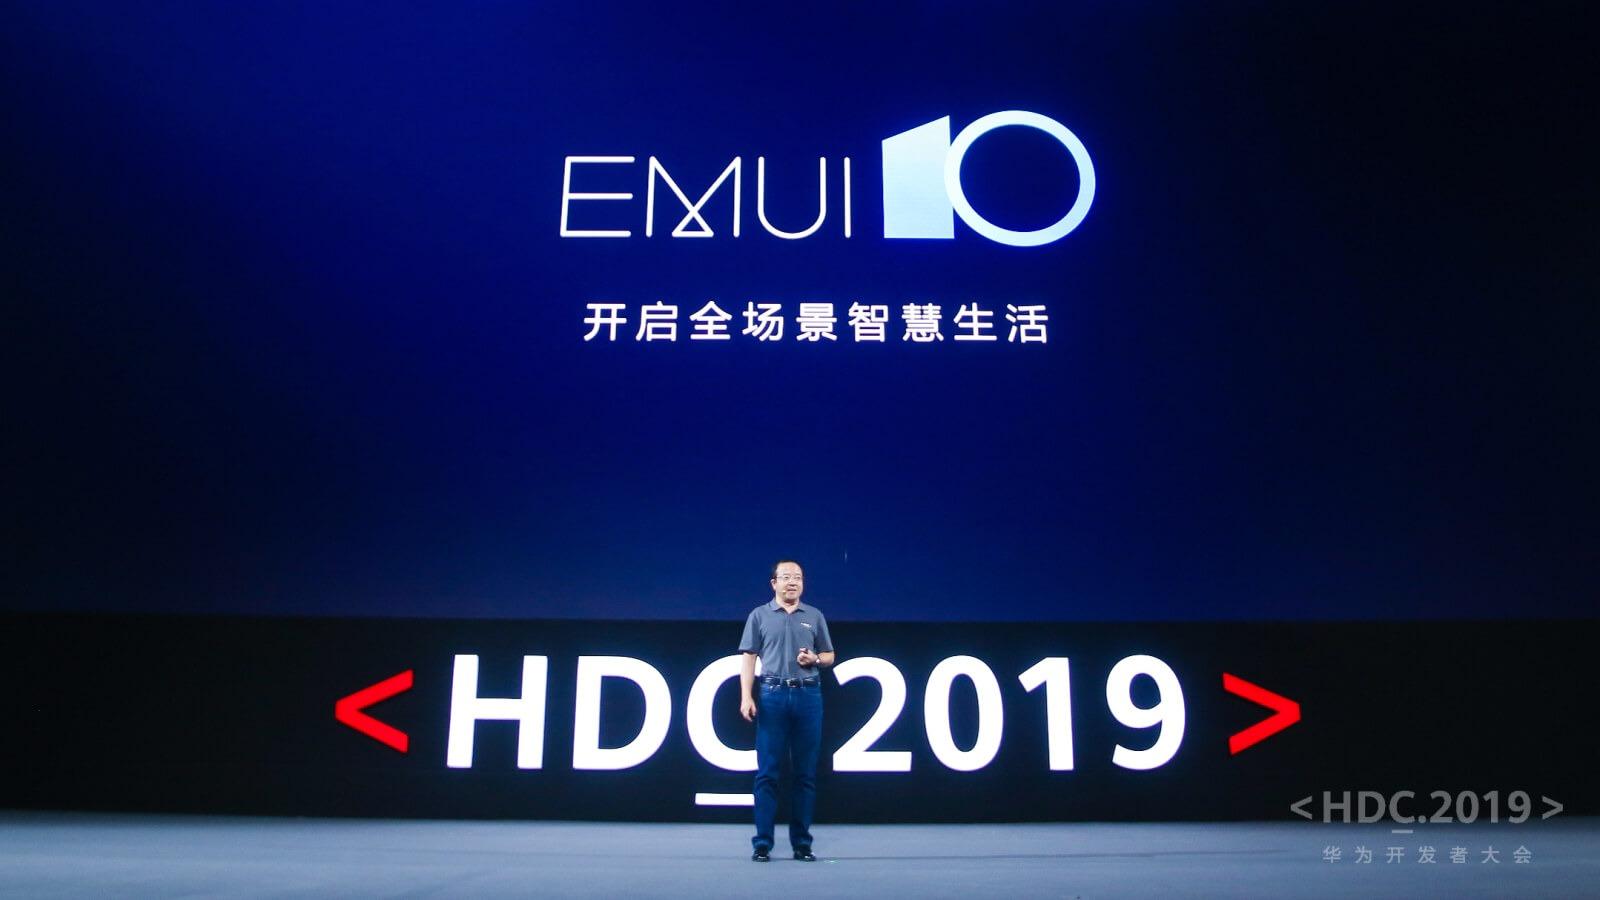 Wang Chenglu, Presidente del Departamento de Ingeniería de Software, Huawei CBG.